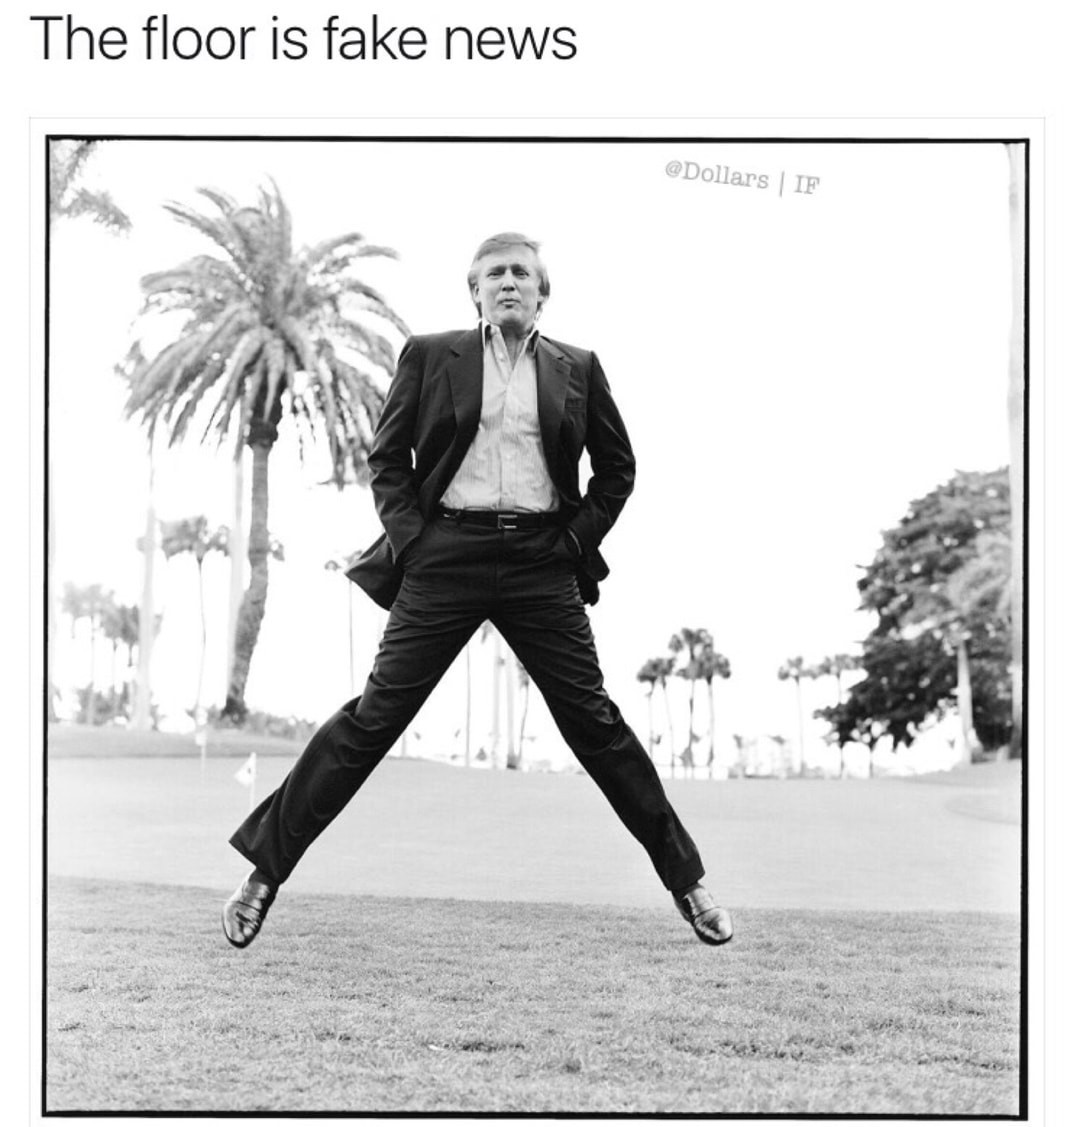 You are fake news - meme